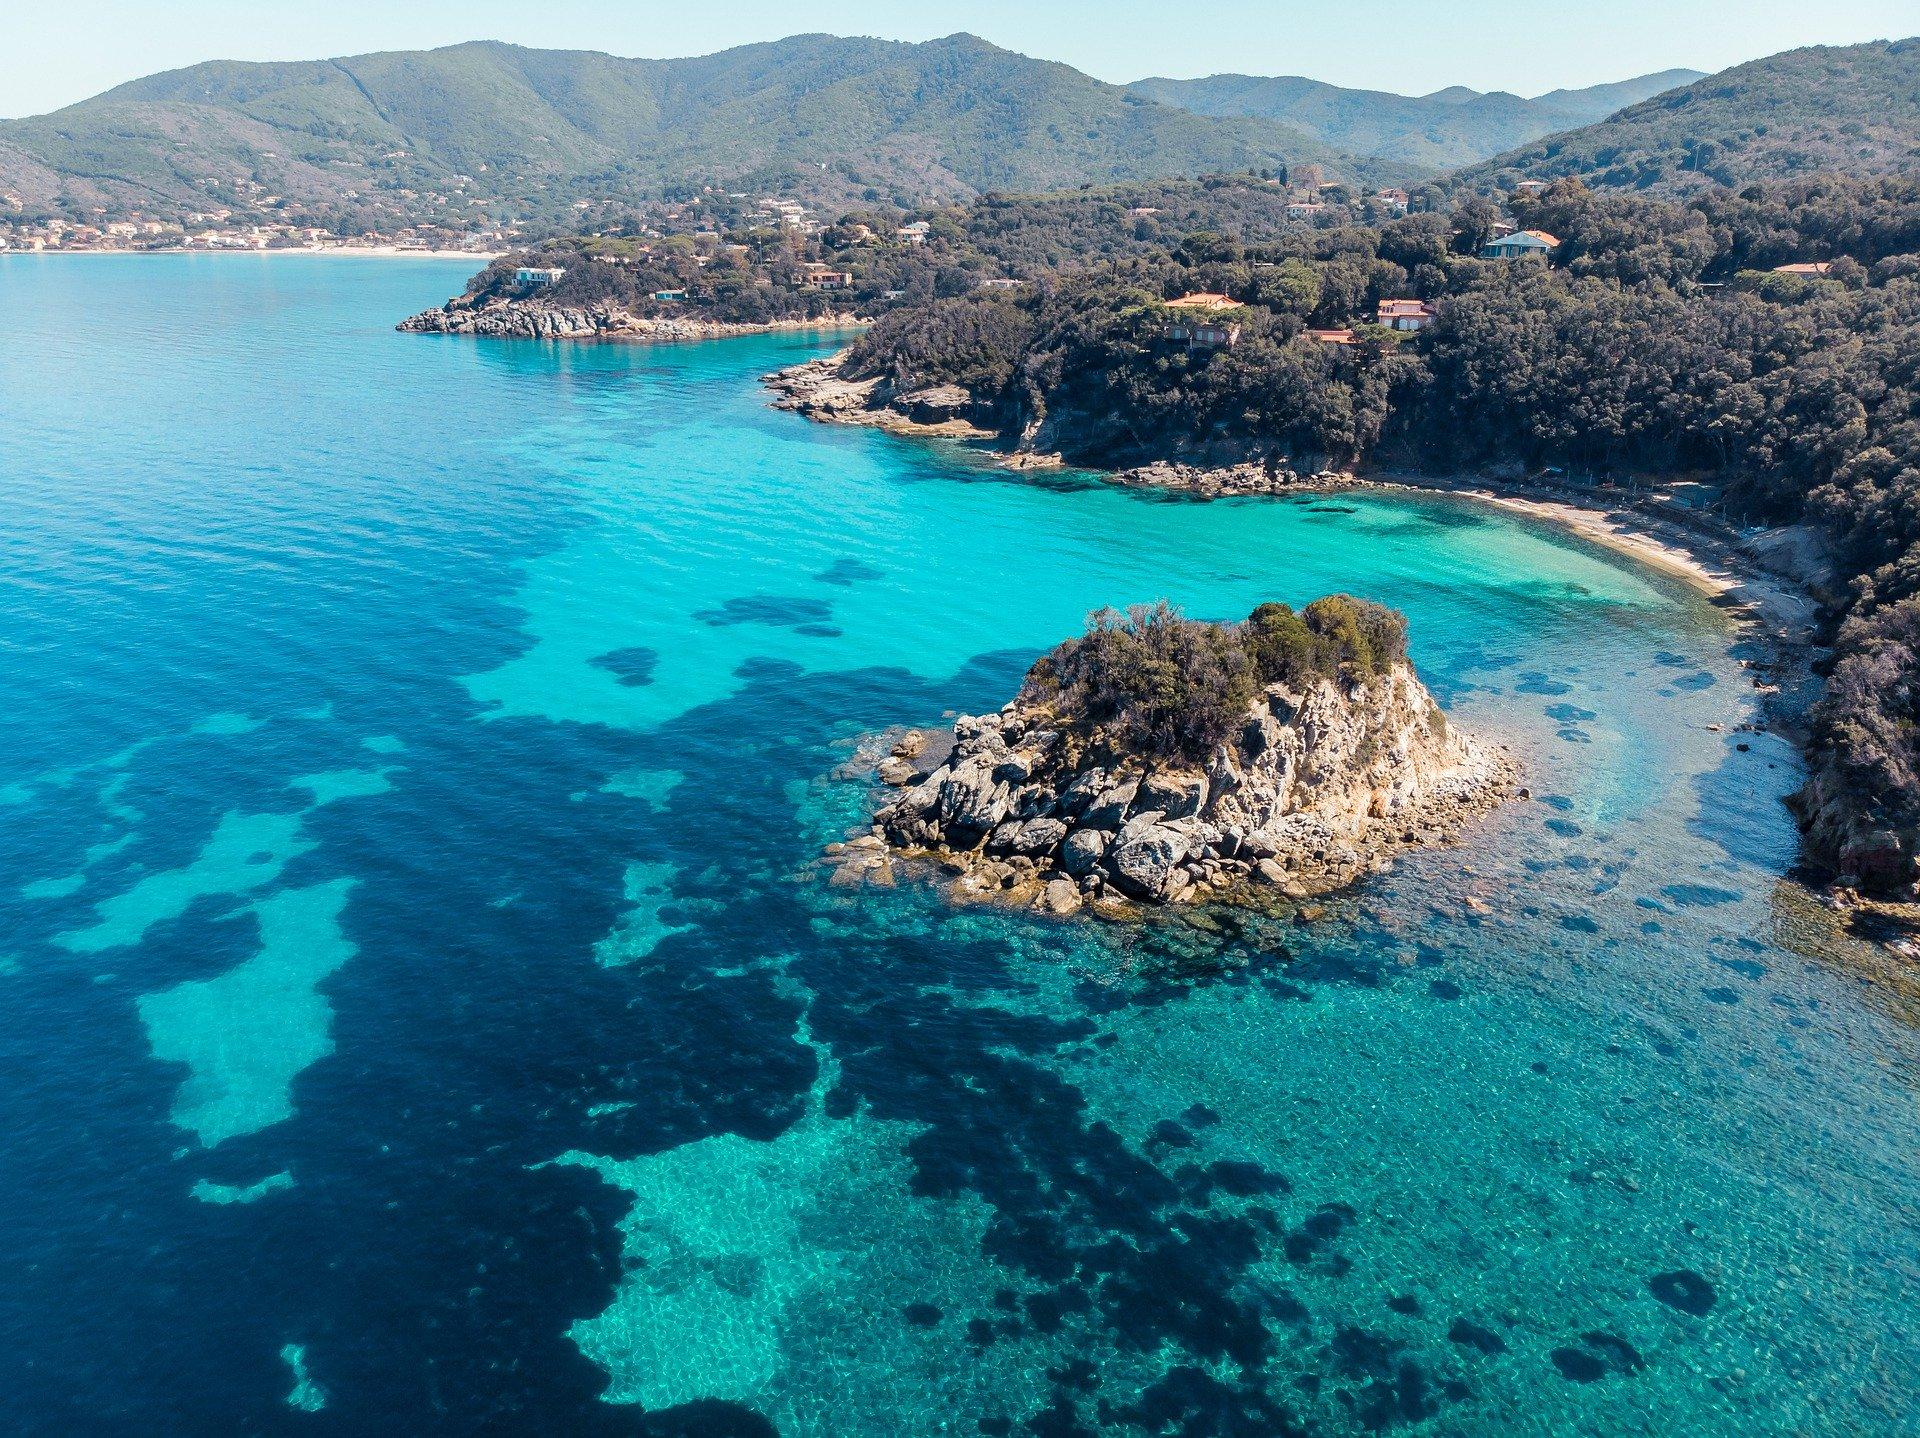 Isola d'Elba, un'isola lussureggiante nel Mediterraneo | Fashion Times